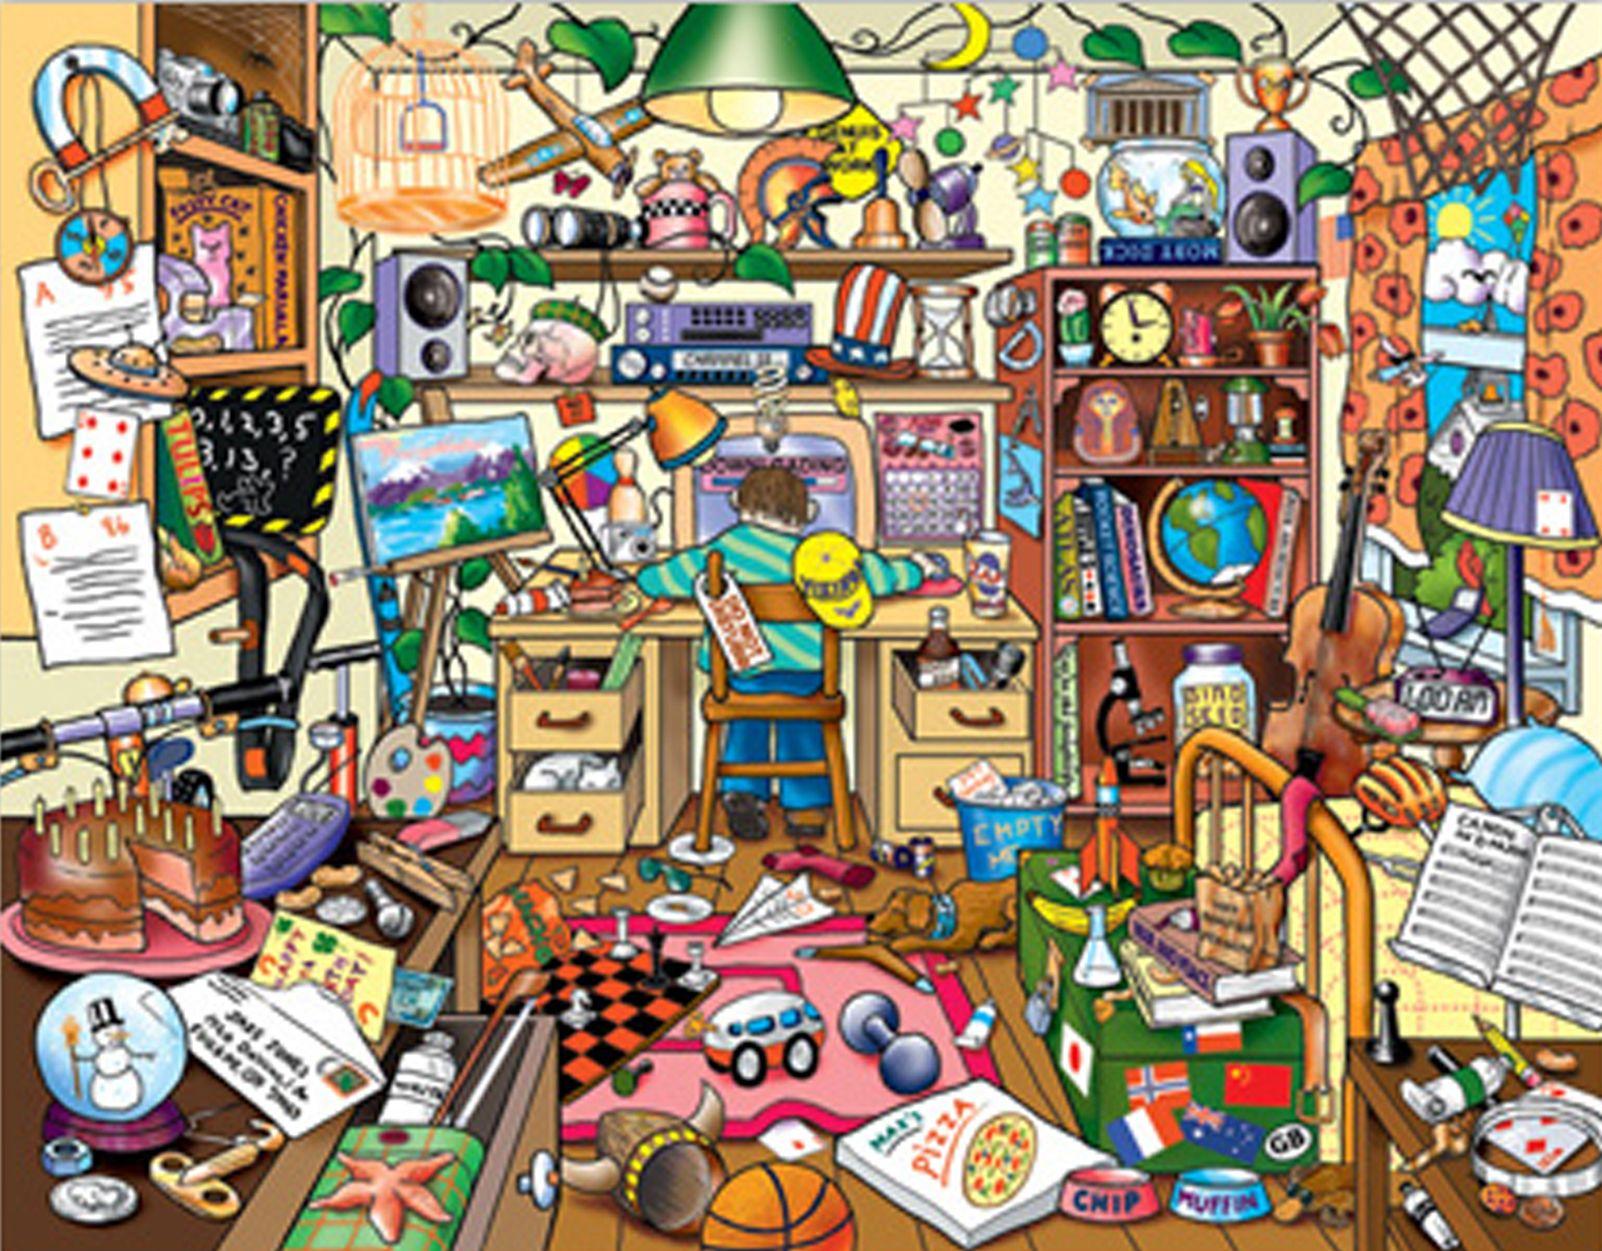 Messy Living Room Clipart Google Search La Casa Room Clutter